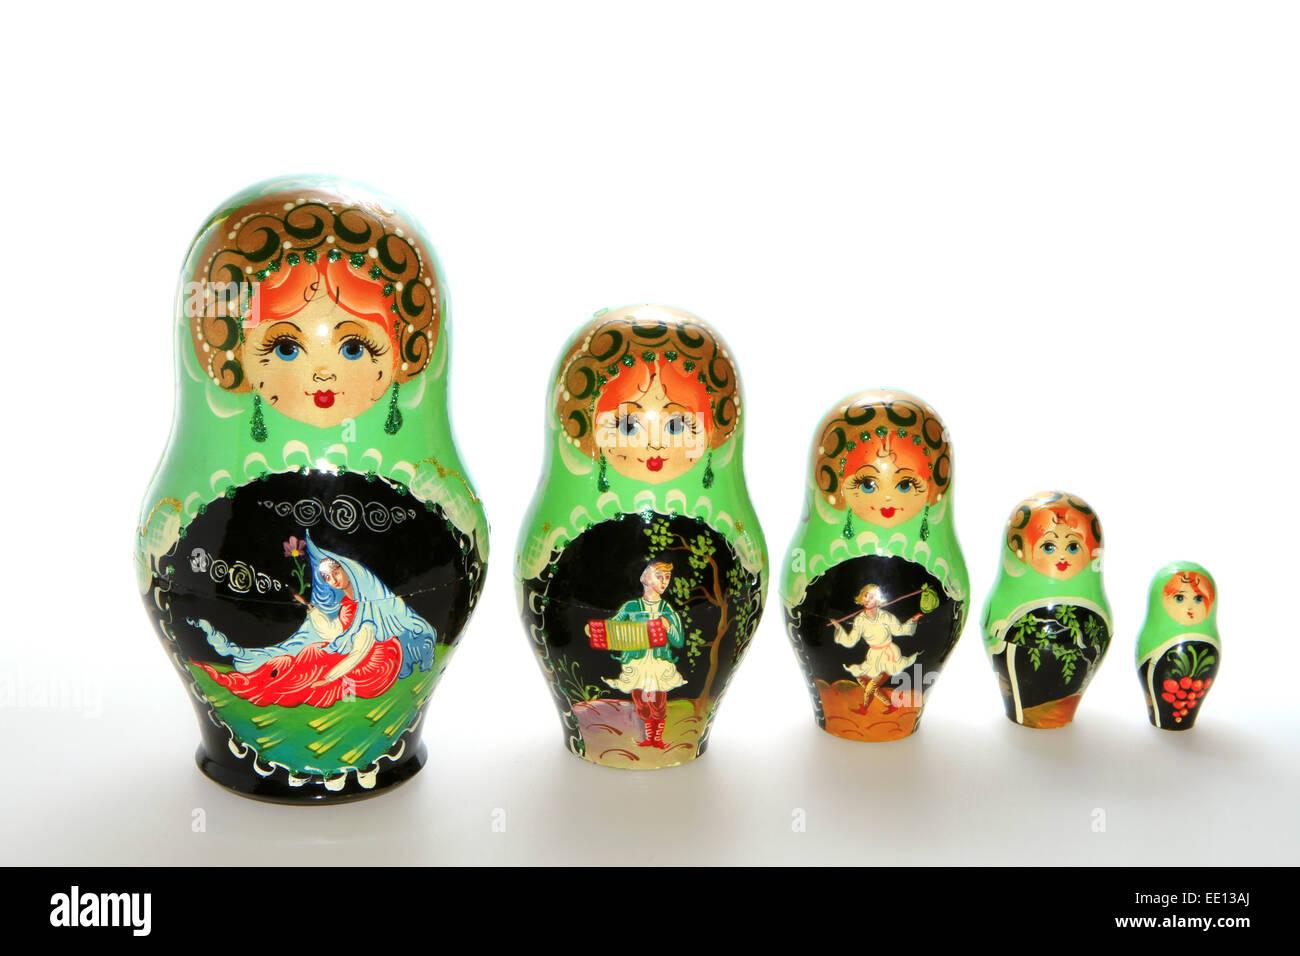 Matrjoschka, Matroschka, volkstuemliche russische Holzpuppe, Schachtelpuppe Stock Photo